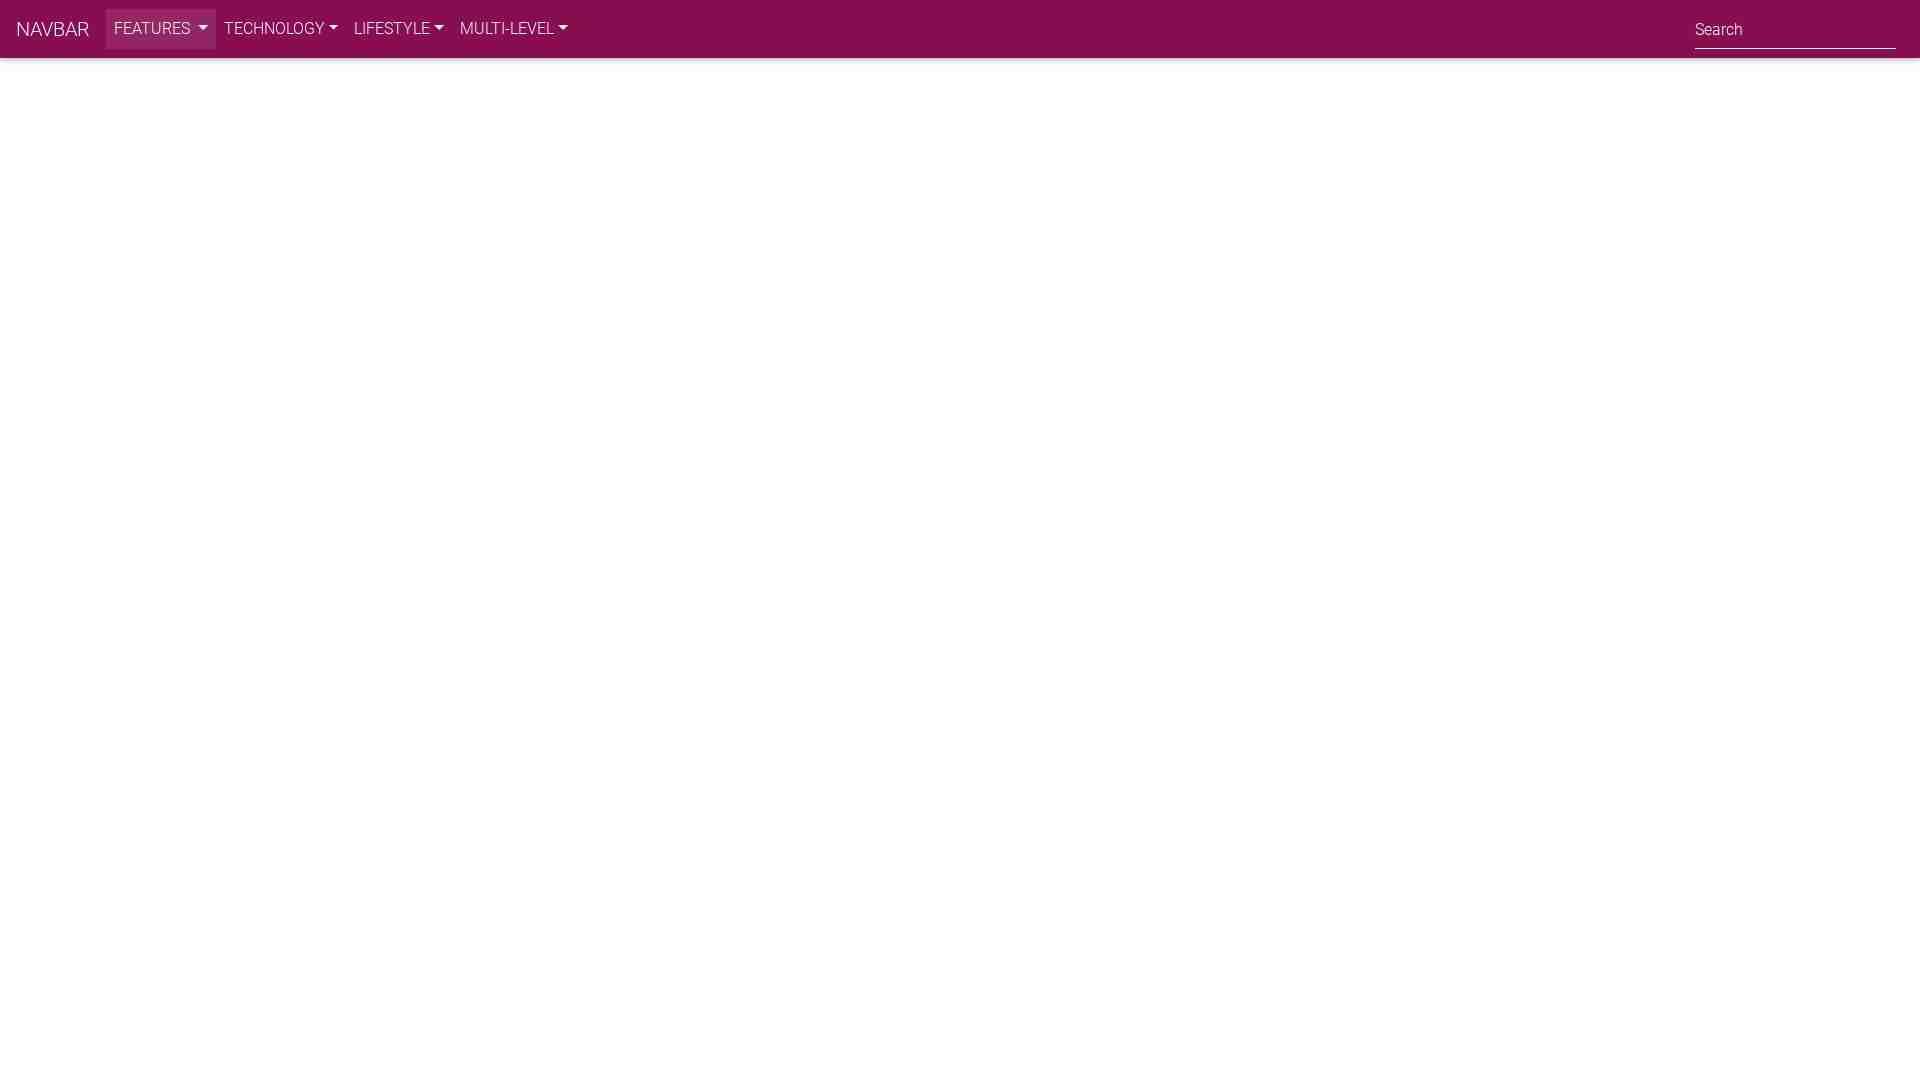 Mega menu with multi-level menu color+